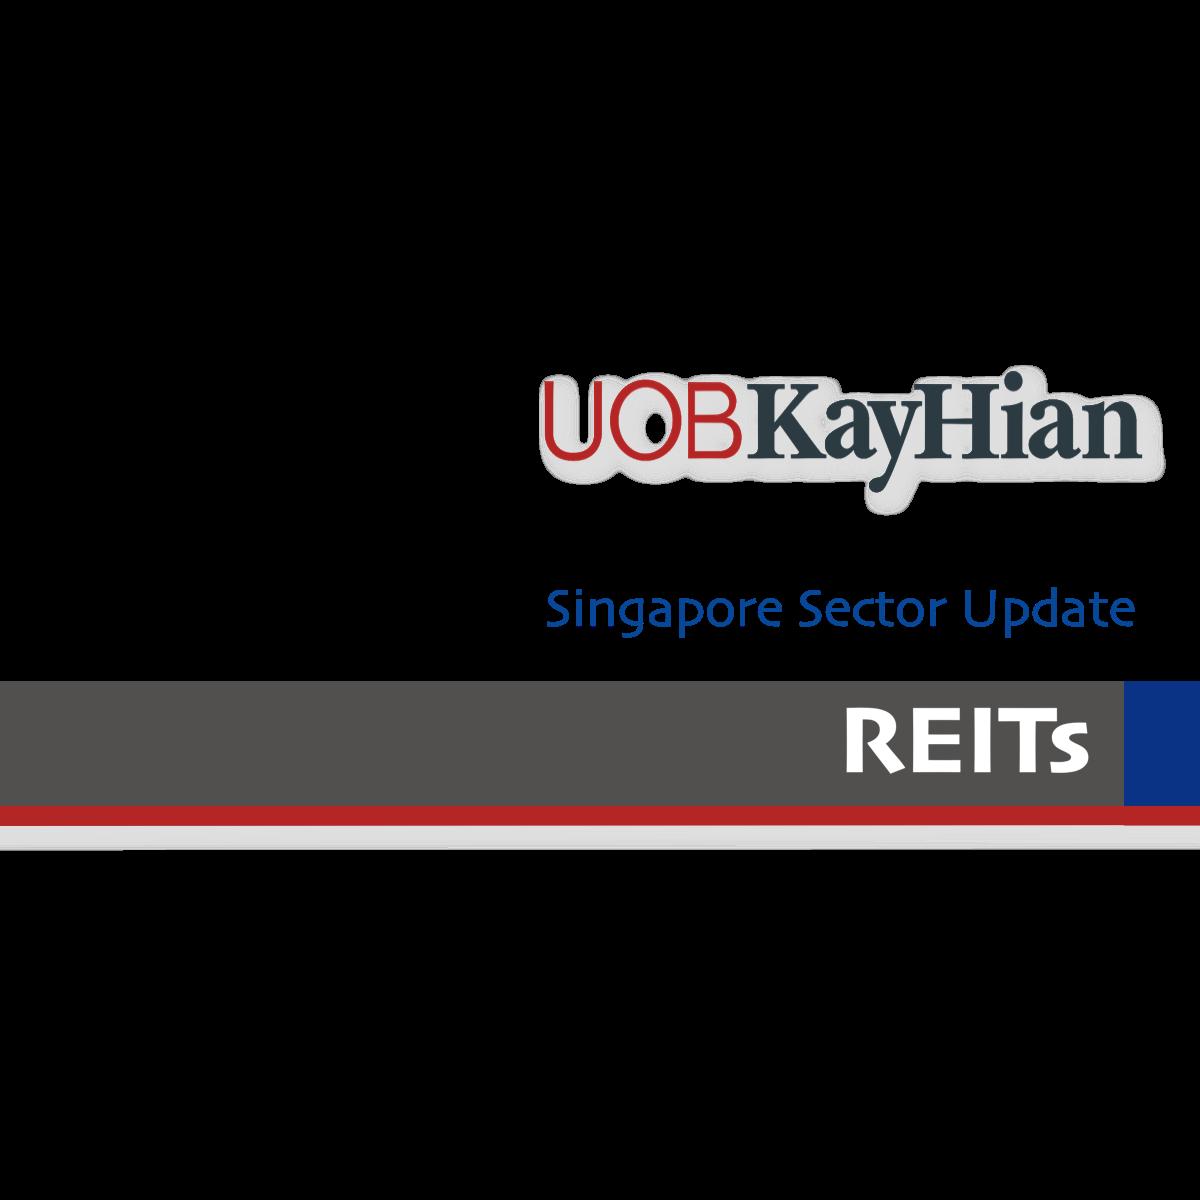 REITs – Singapore - UOB Kay Hian Research | SGinvestors.io